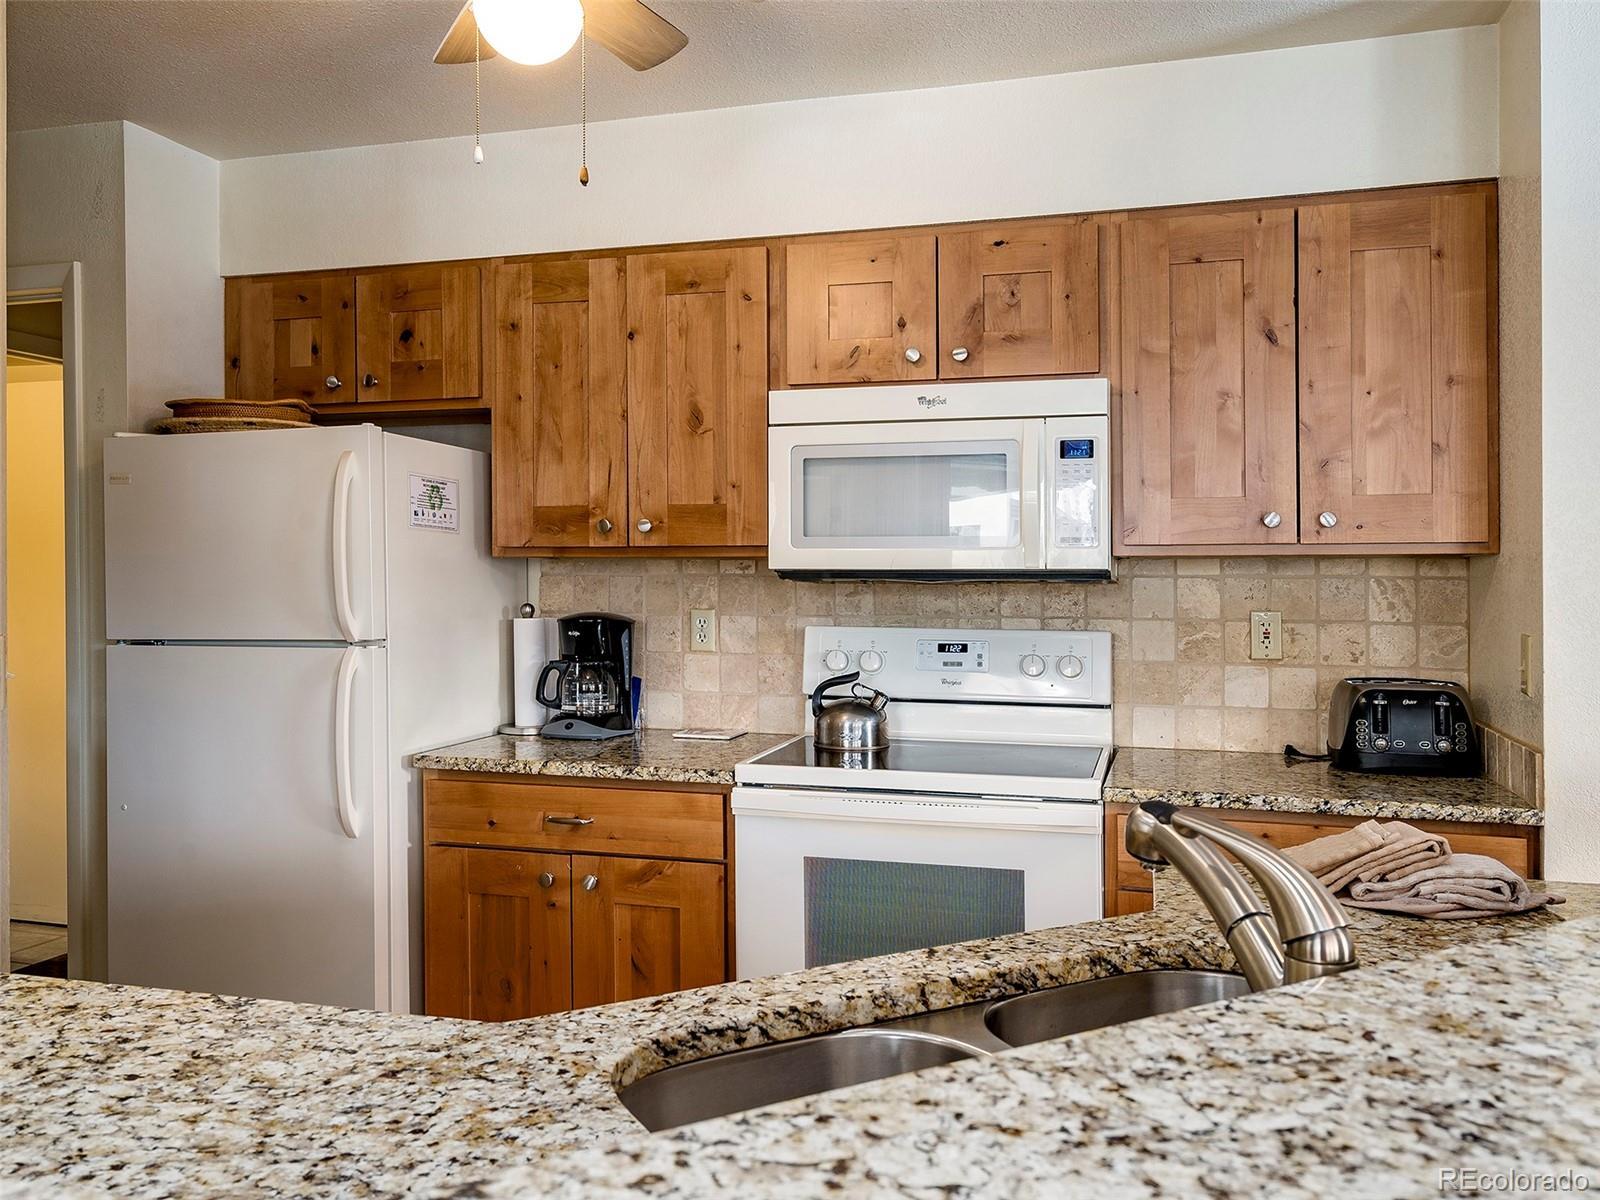 MLS# 4193338 - 8 - 2700 Village Drive #D-204, Steamboat Springs, CO 80487